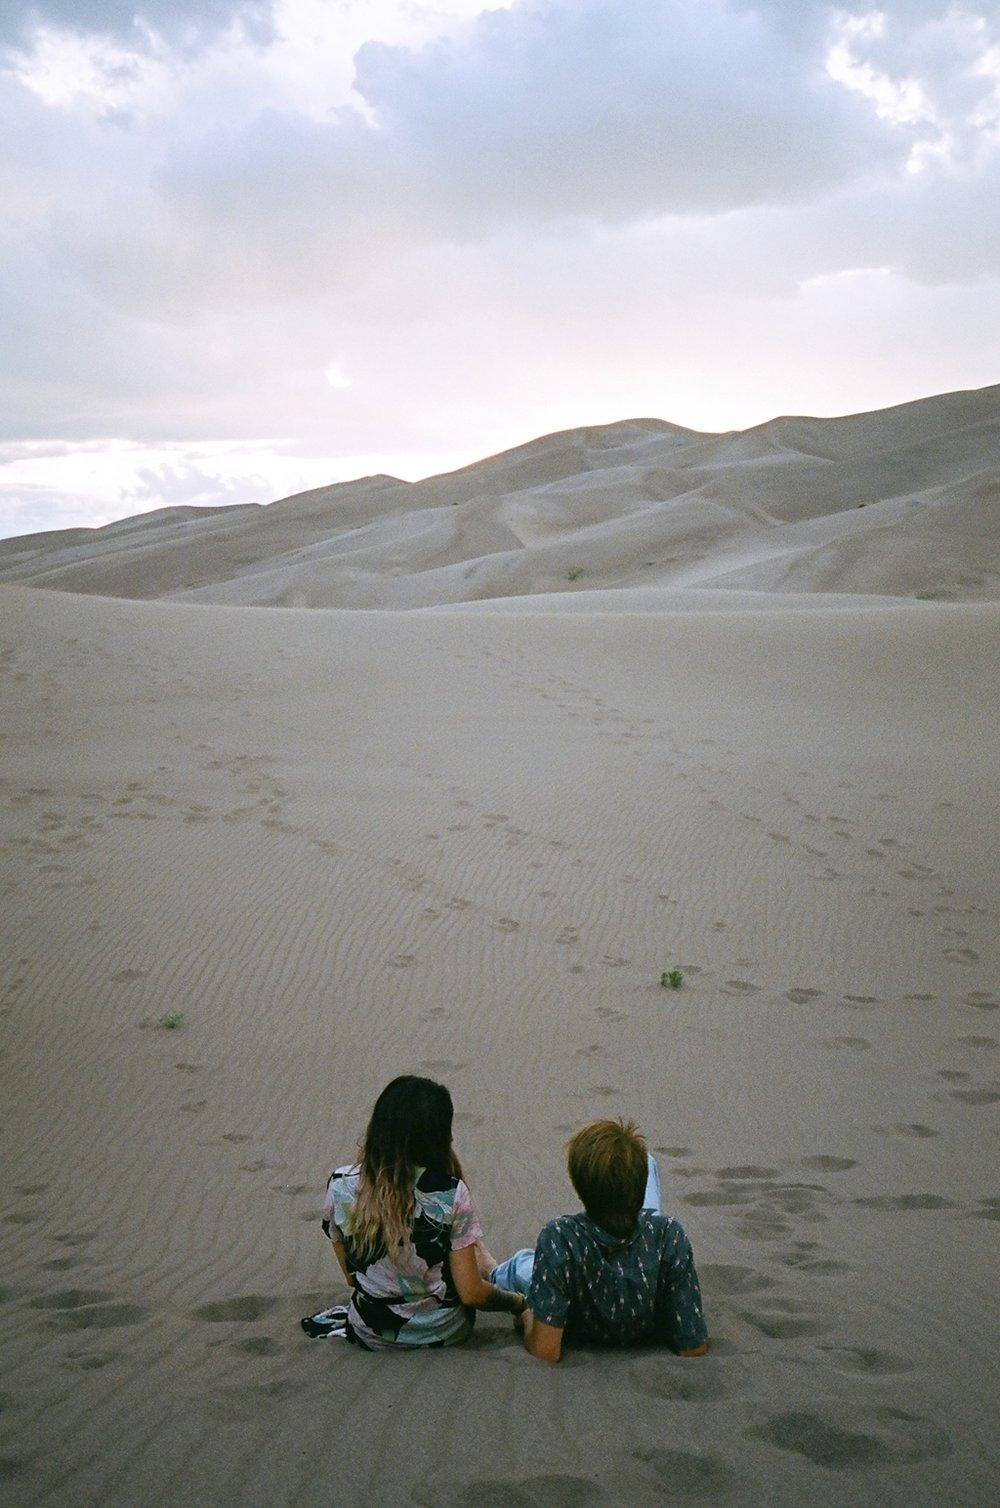 sand-dunes-portraits